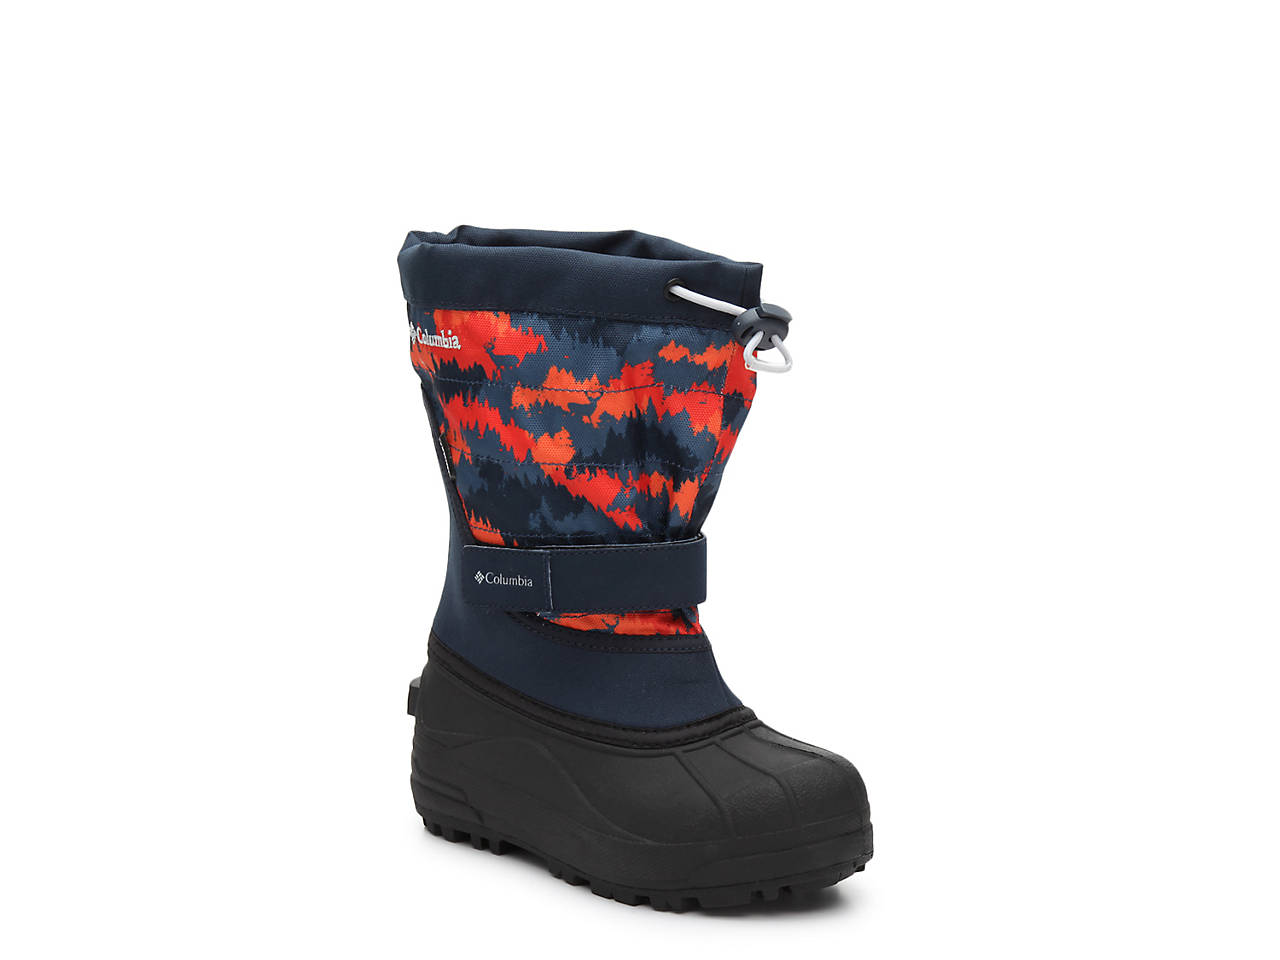 776ab46fc4c3 Columbia Powderbug Plus II Youth Snow Boot Kids Shoes